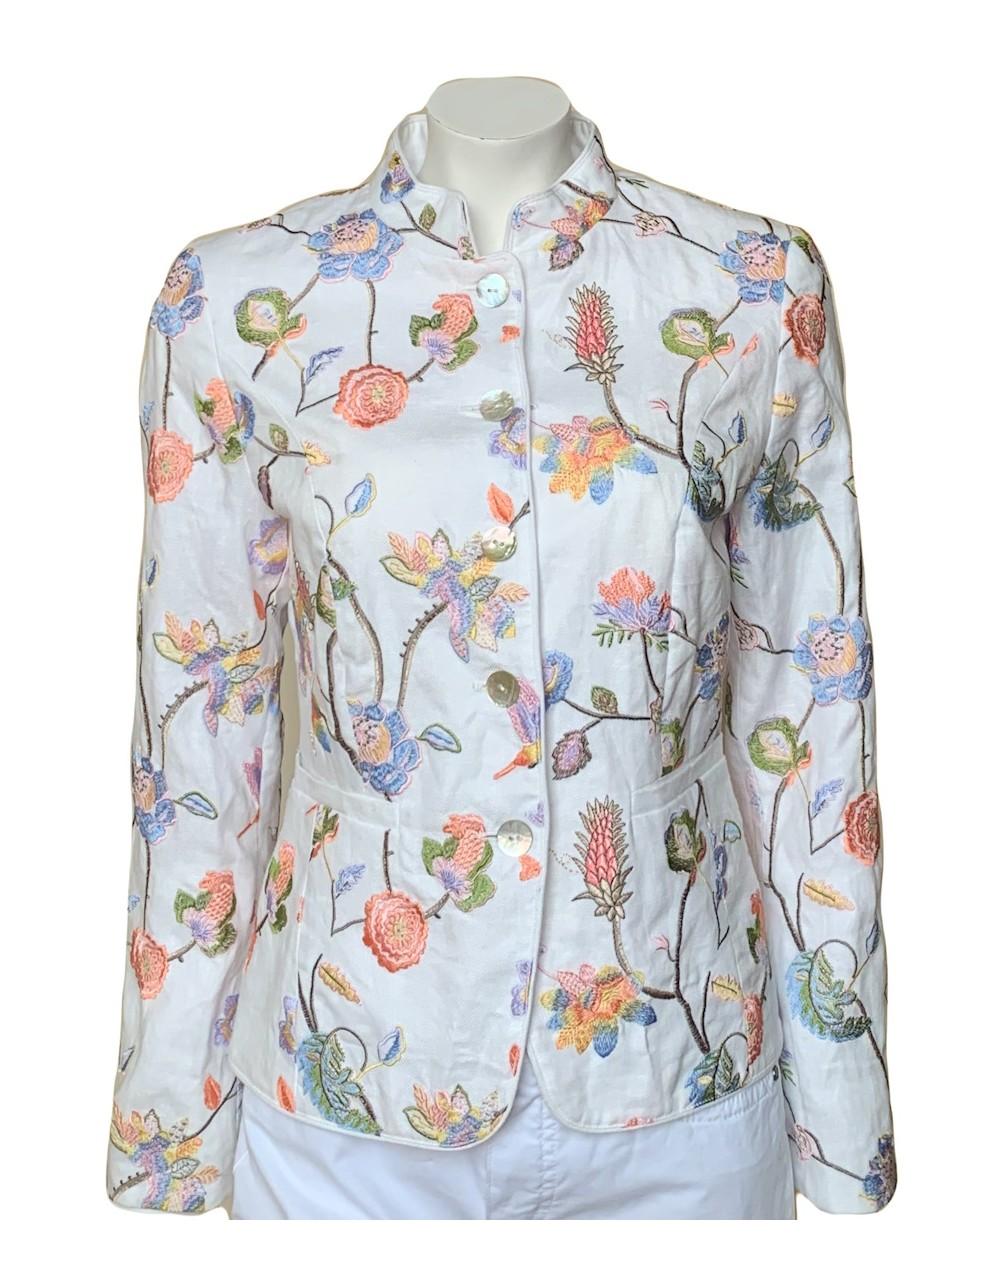 Rofa White Label Linen Jacket - Off White|Rofa Fashions|Irish Handcrafts 1